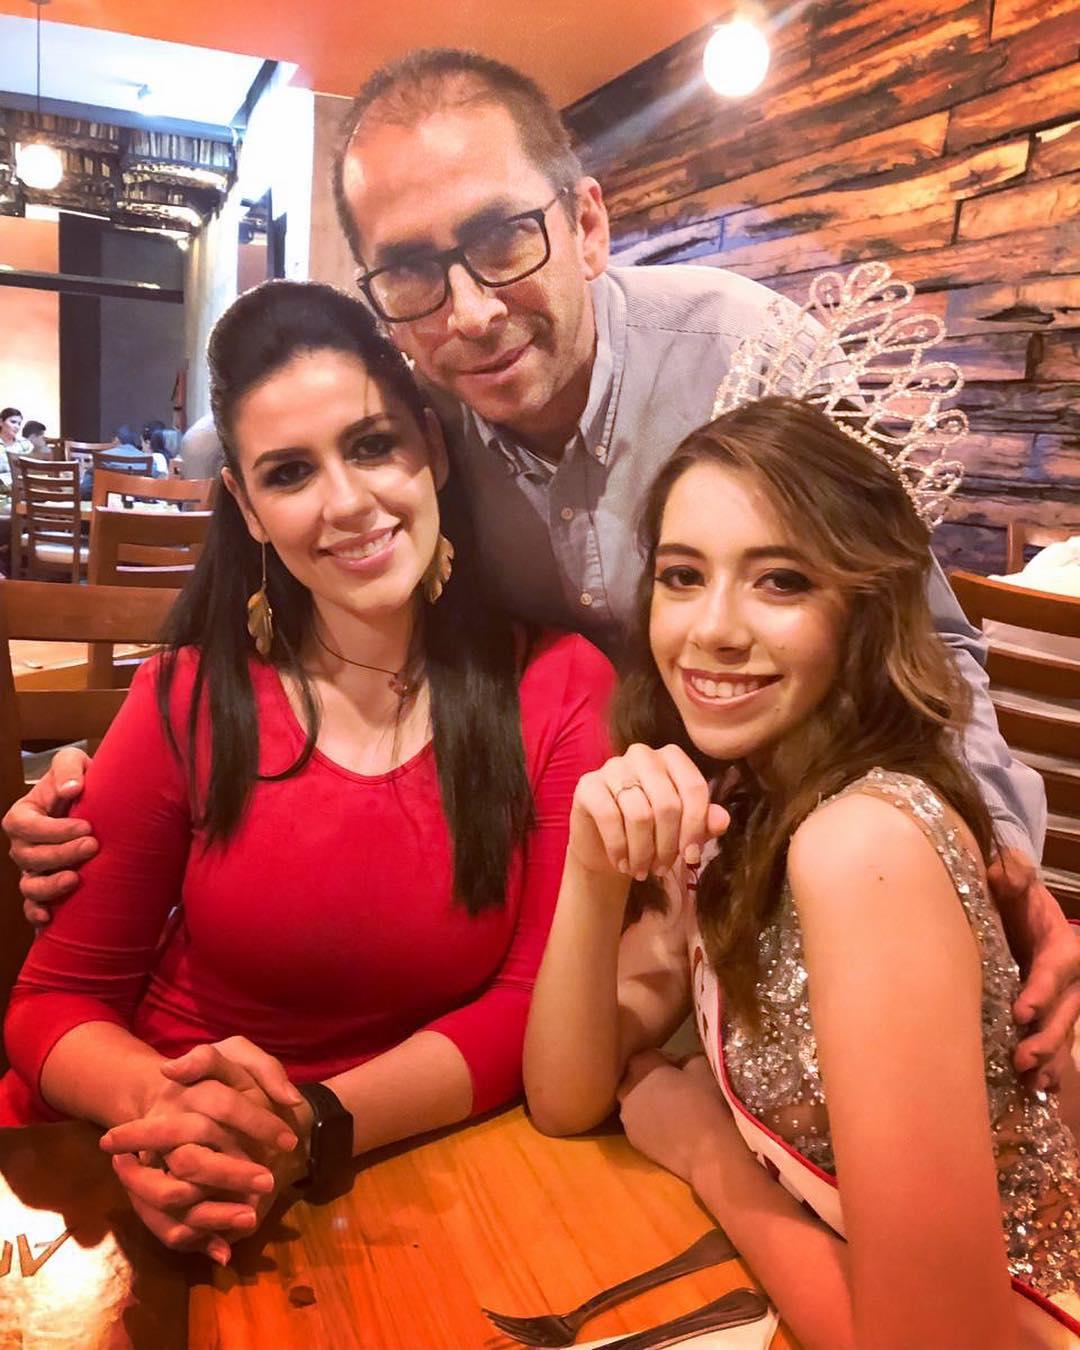 maya mejia ospina, miss teen mundial colombia 2019. 51919813